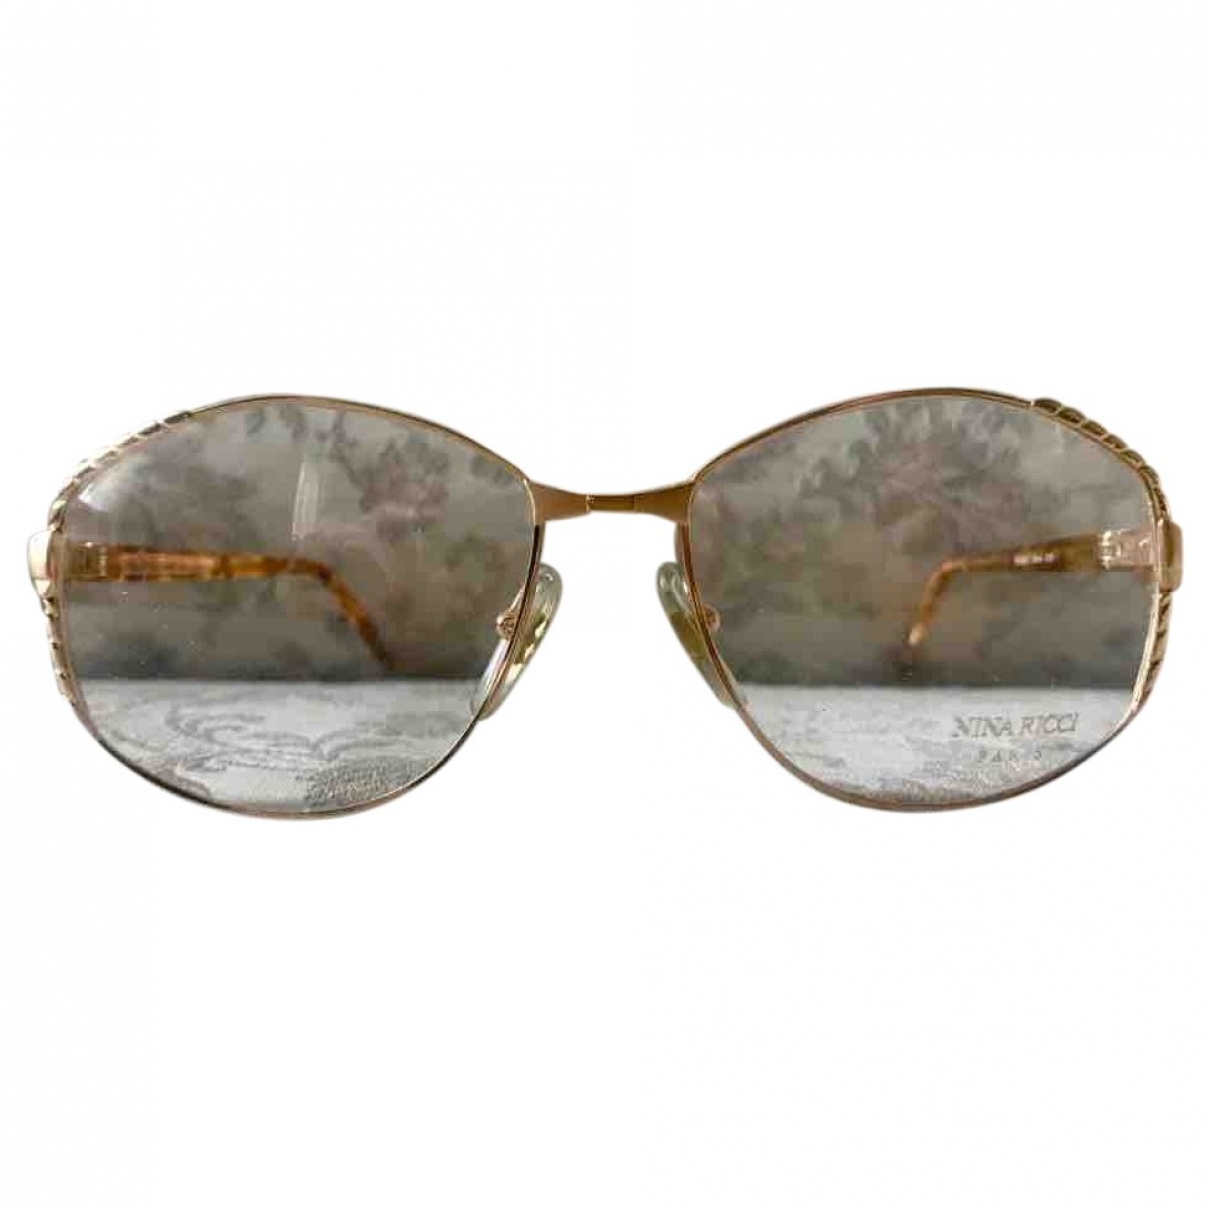 Gafas Nina Ricci